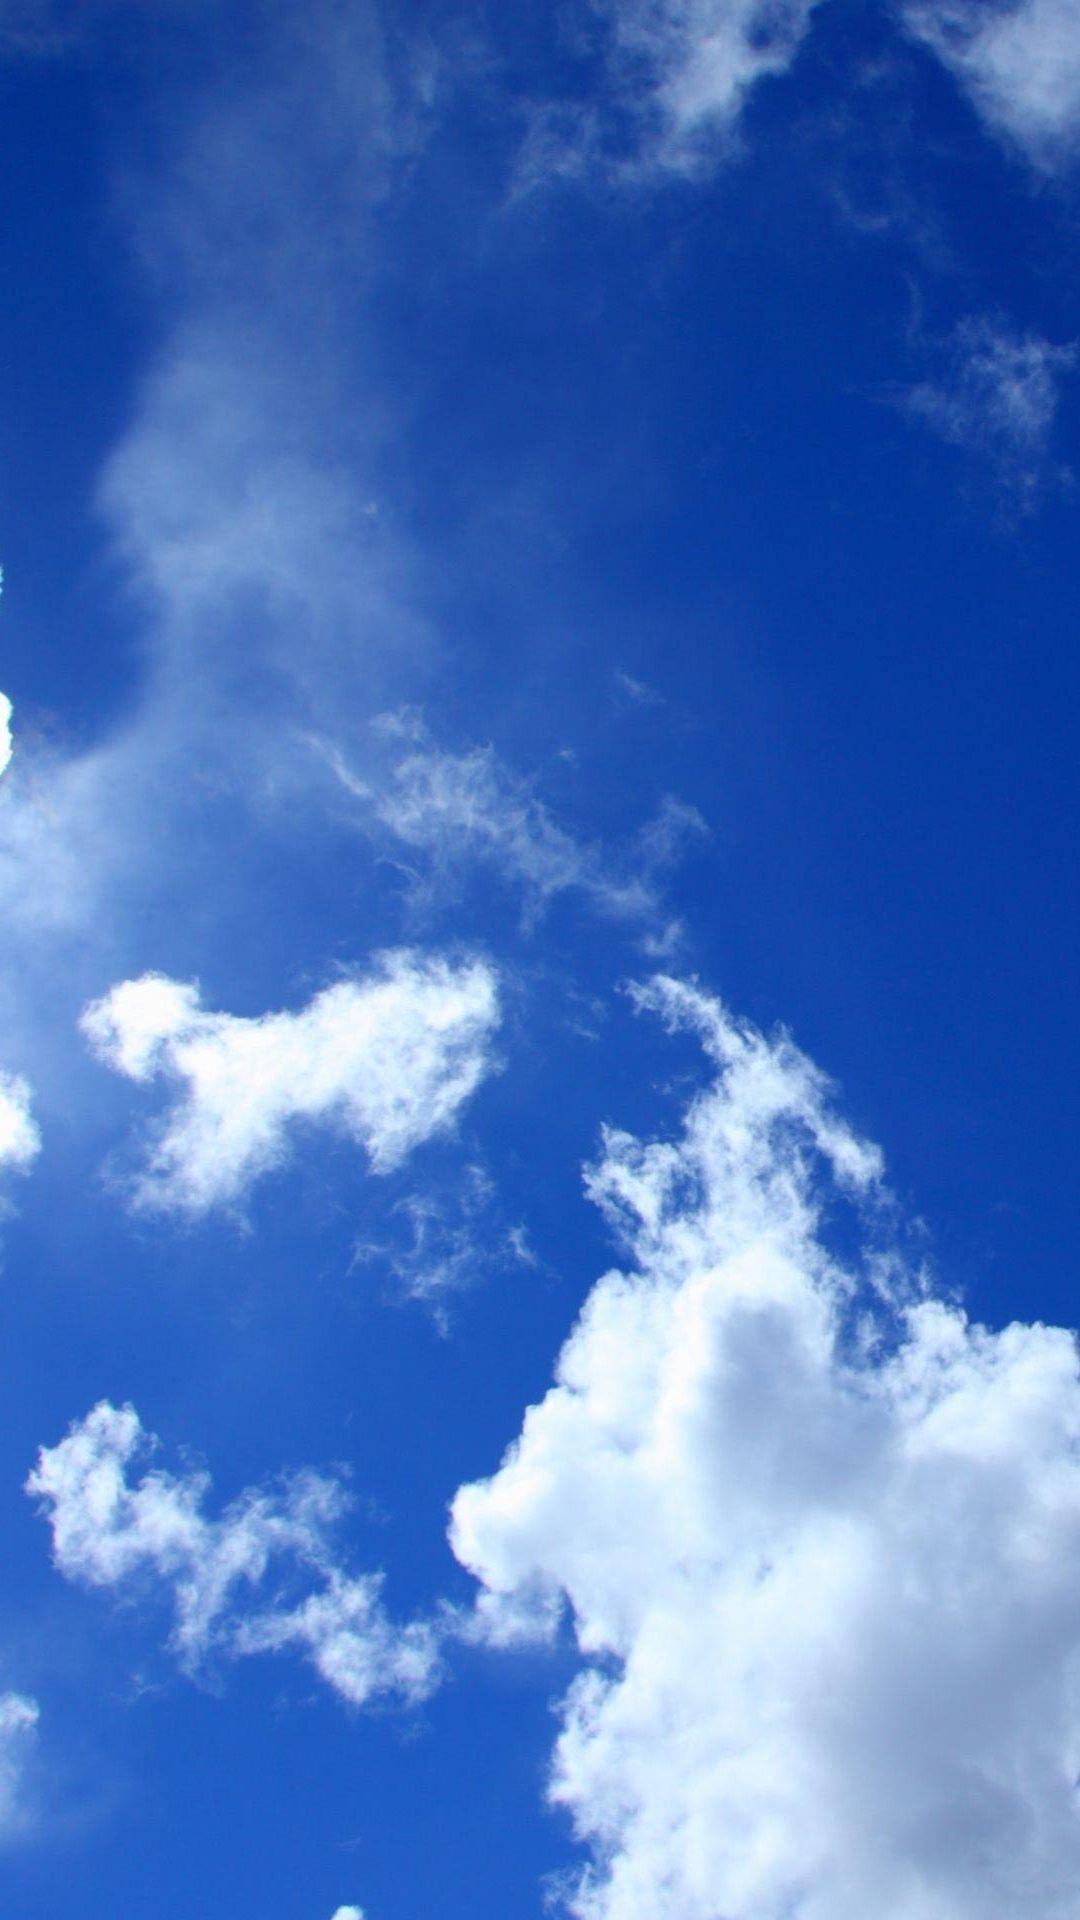 Blue Sky White Clouds Lockscreen iPhone 6 Plus HD Wallpaper